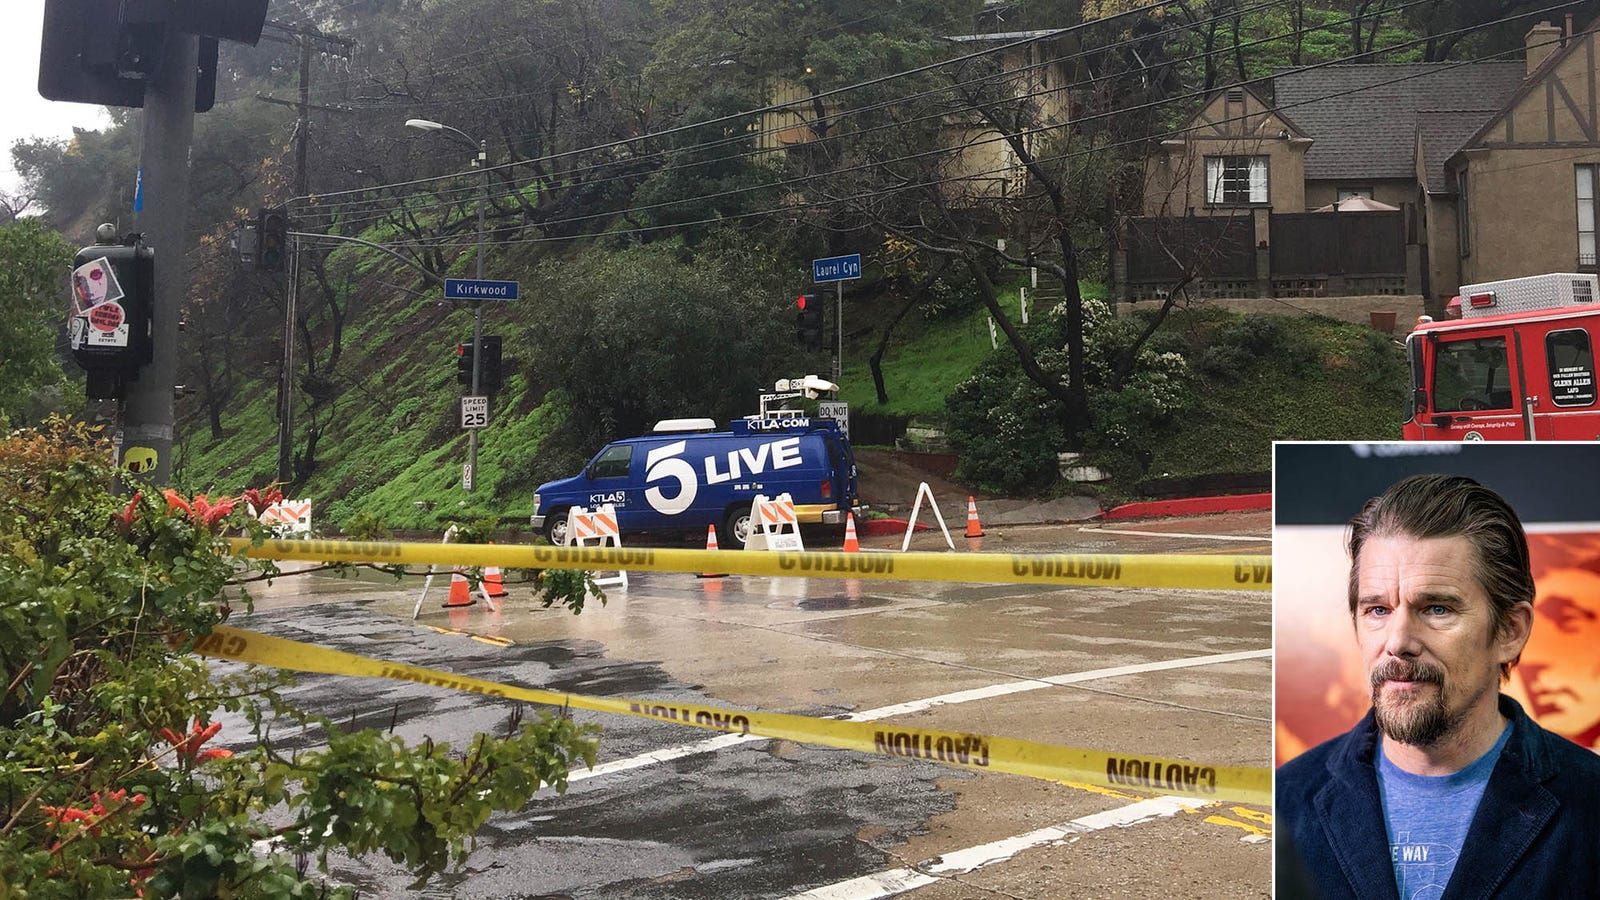 Ethan Hawke's Body Found Dumped In Laurel Canyon As 2019 Oscar Race Heats Up